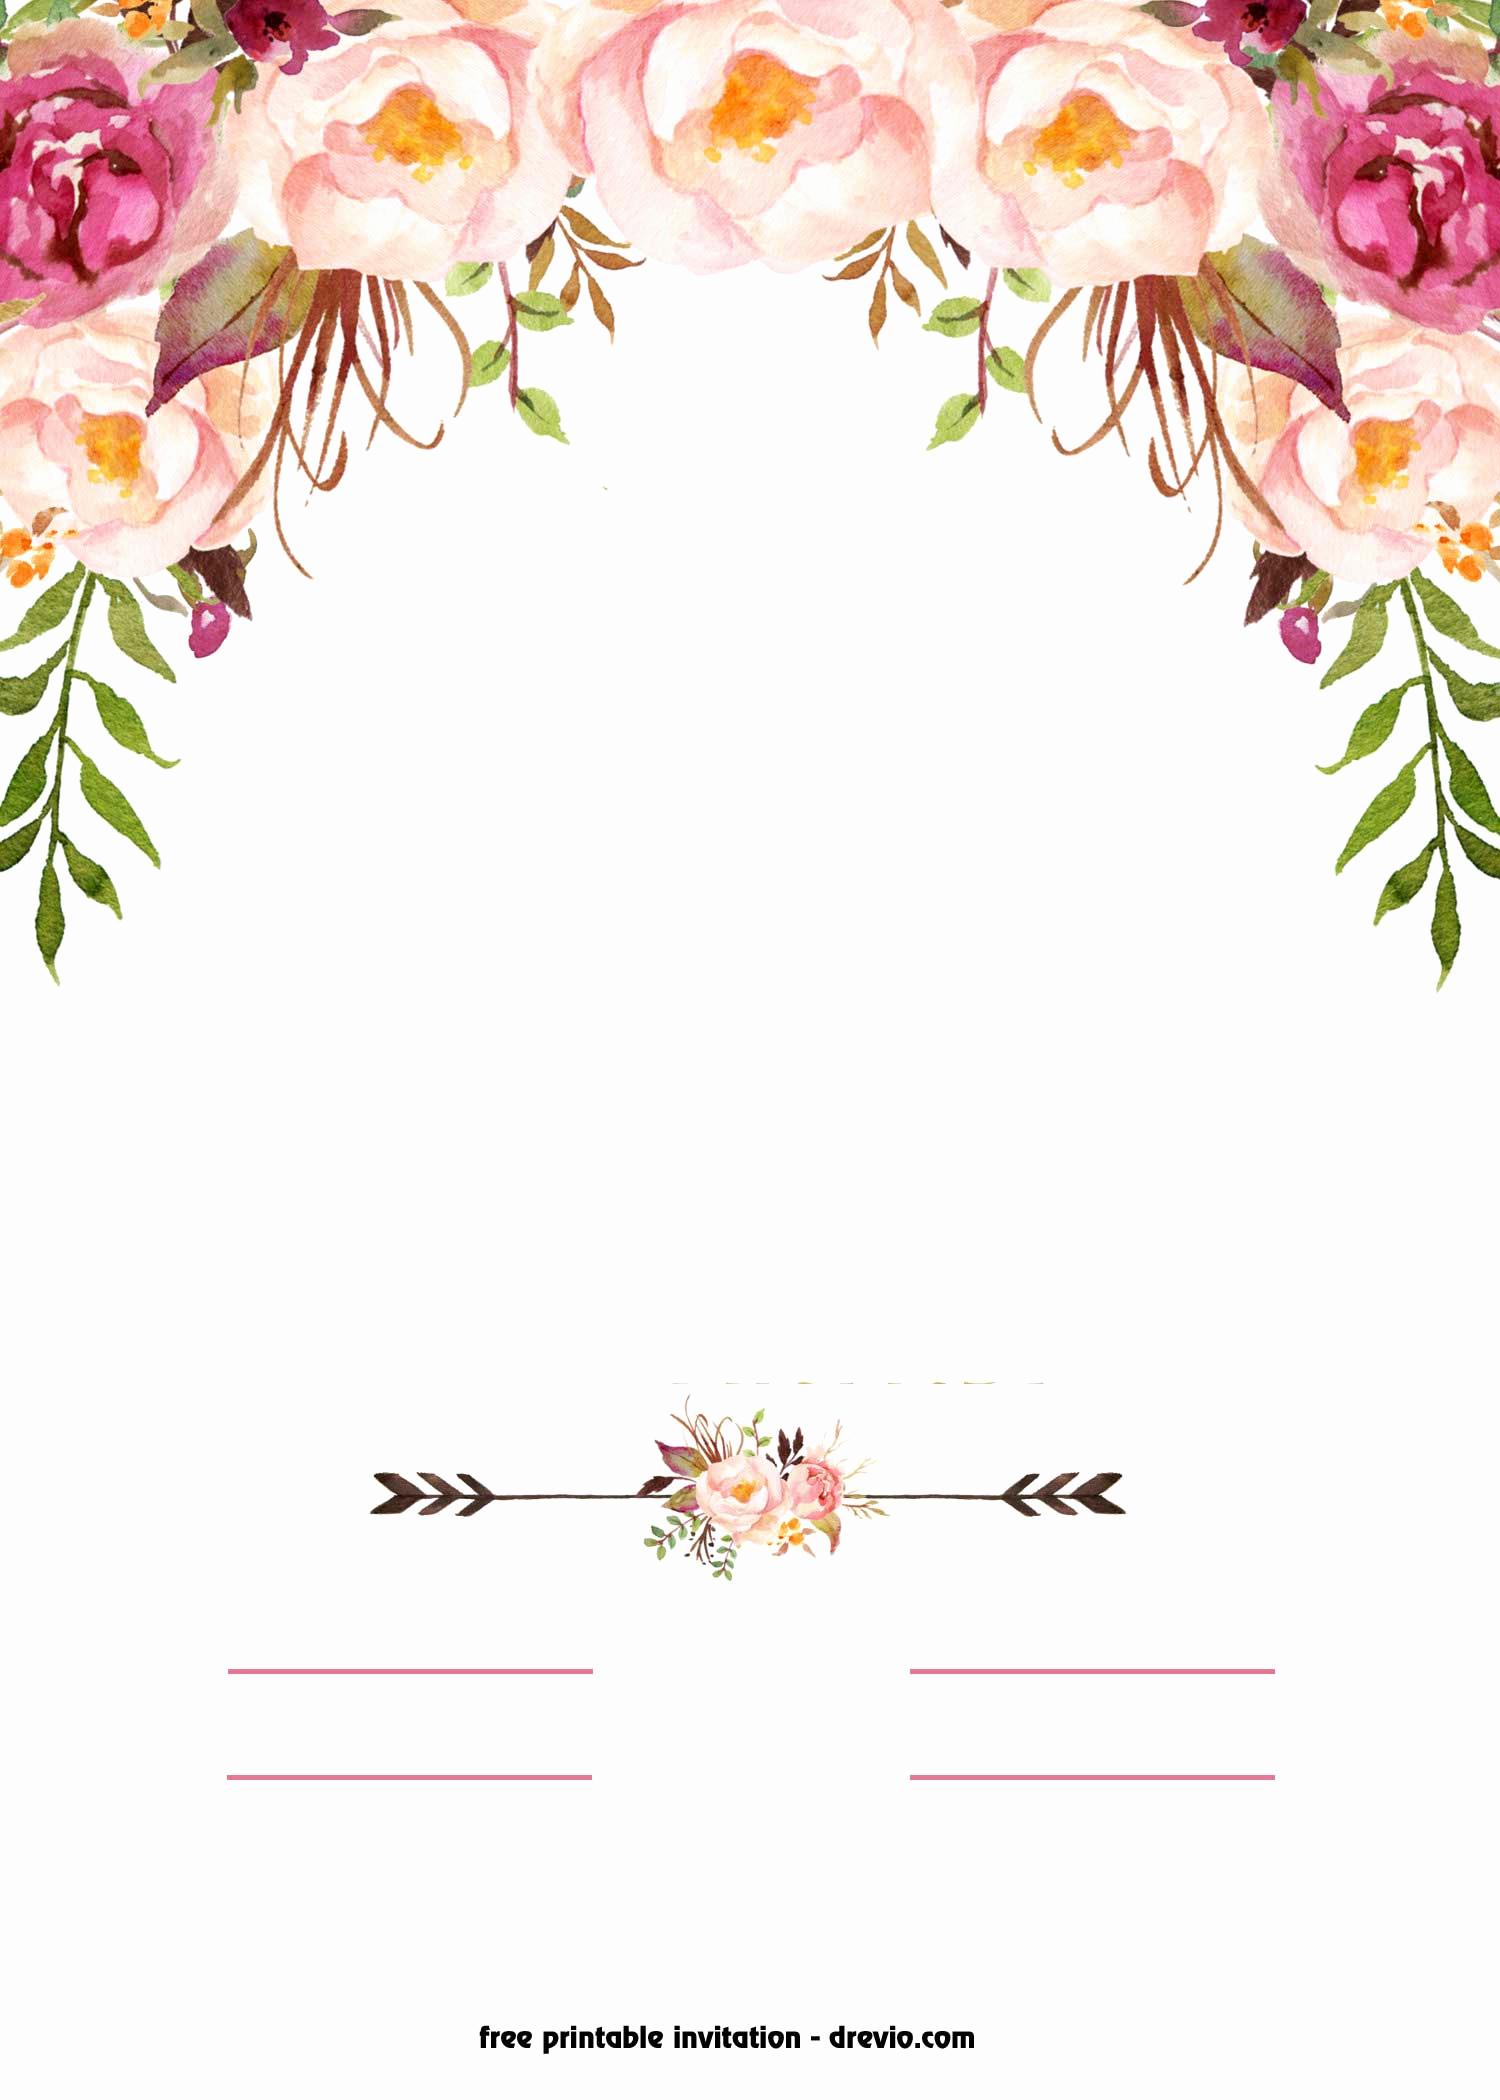 Free Online Invitation Templates Beautiful Free Printable Boho Chic Flower Baby Shower Invitation